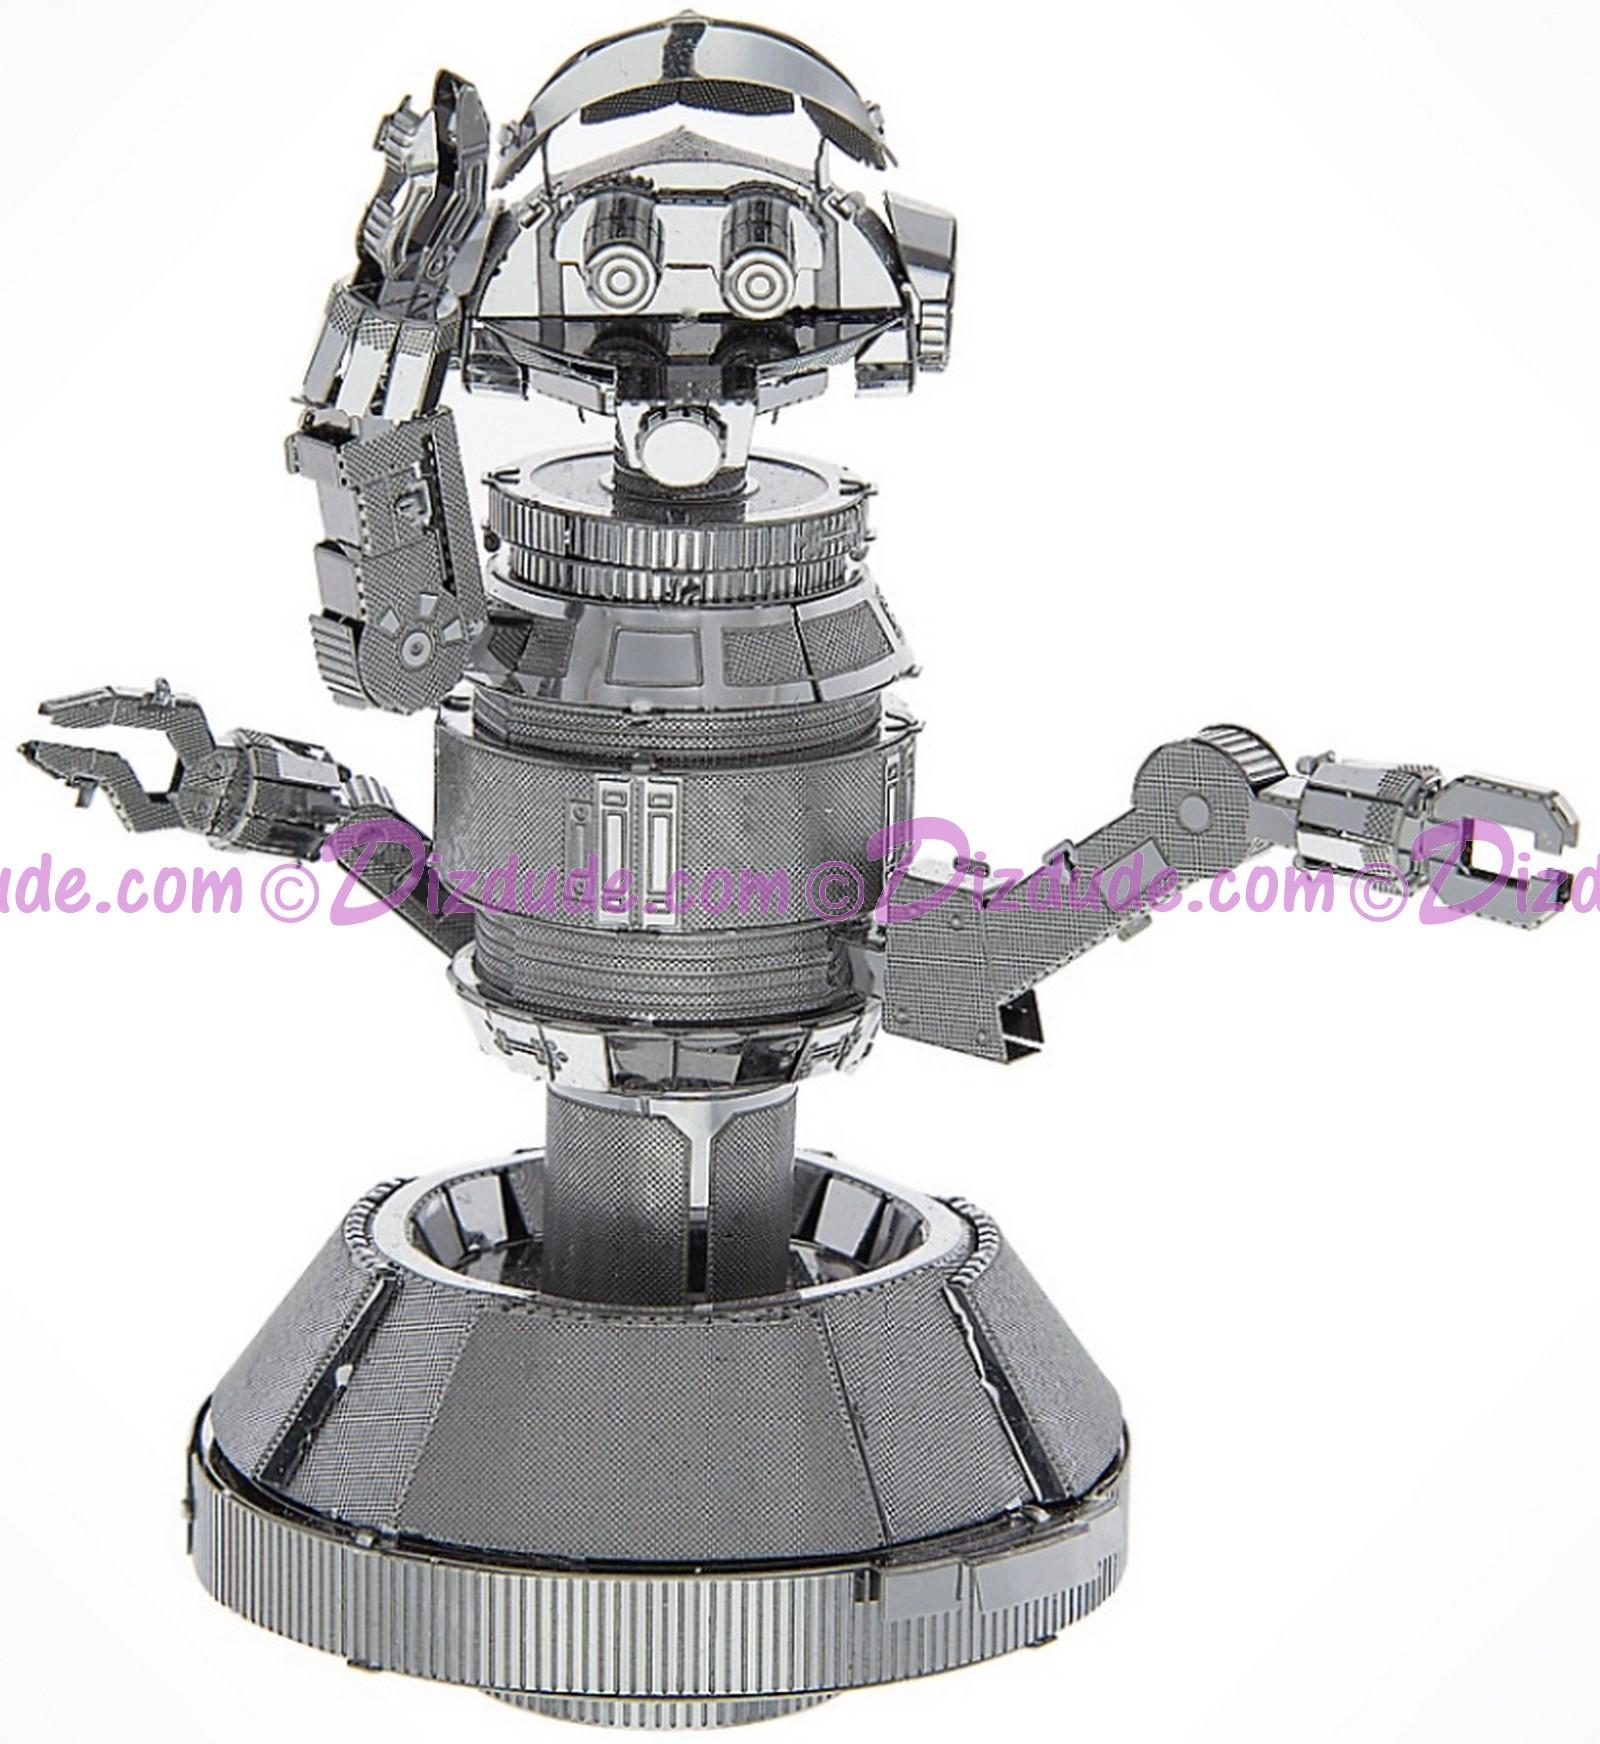 Disney Star Wars Captain Rex 3D Metal Model Kit © Dizdude.com